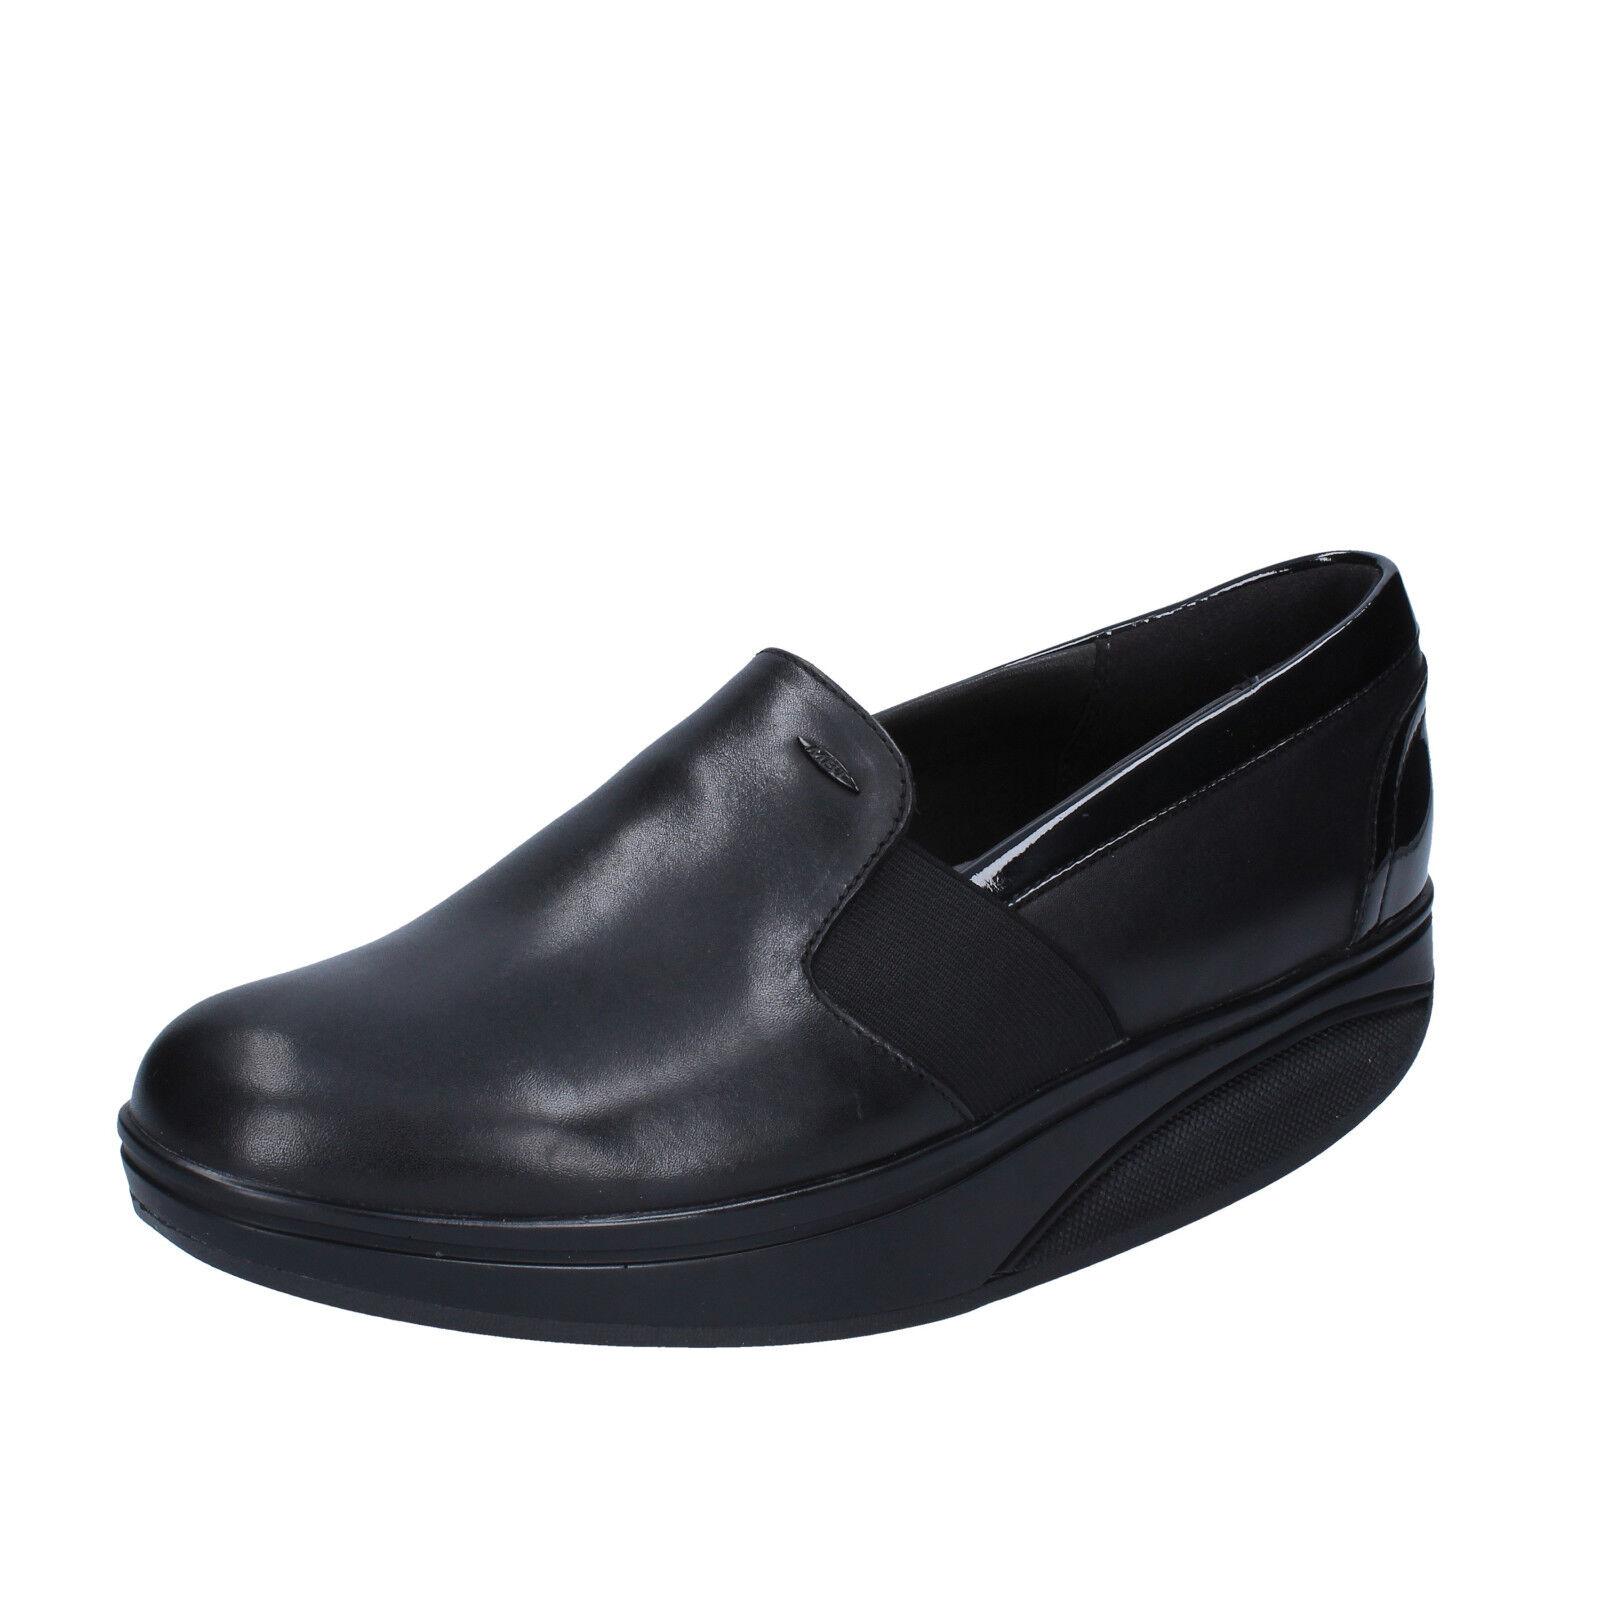 forma unica Donna  scarpe scarpe scarpe MBT 6   6,5 (EU 37) slip on loafers nero leather dynamic AC997-C  negozio online